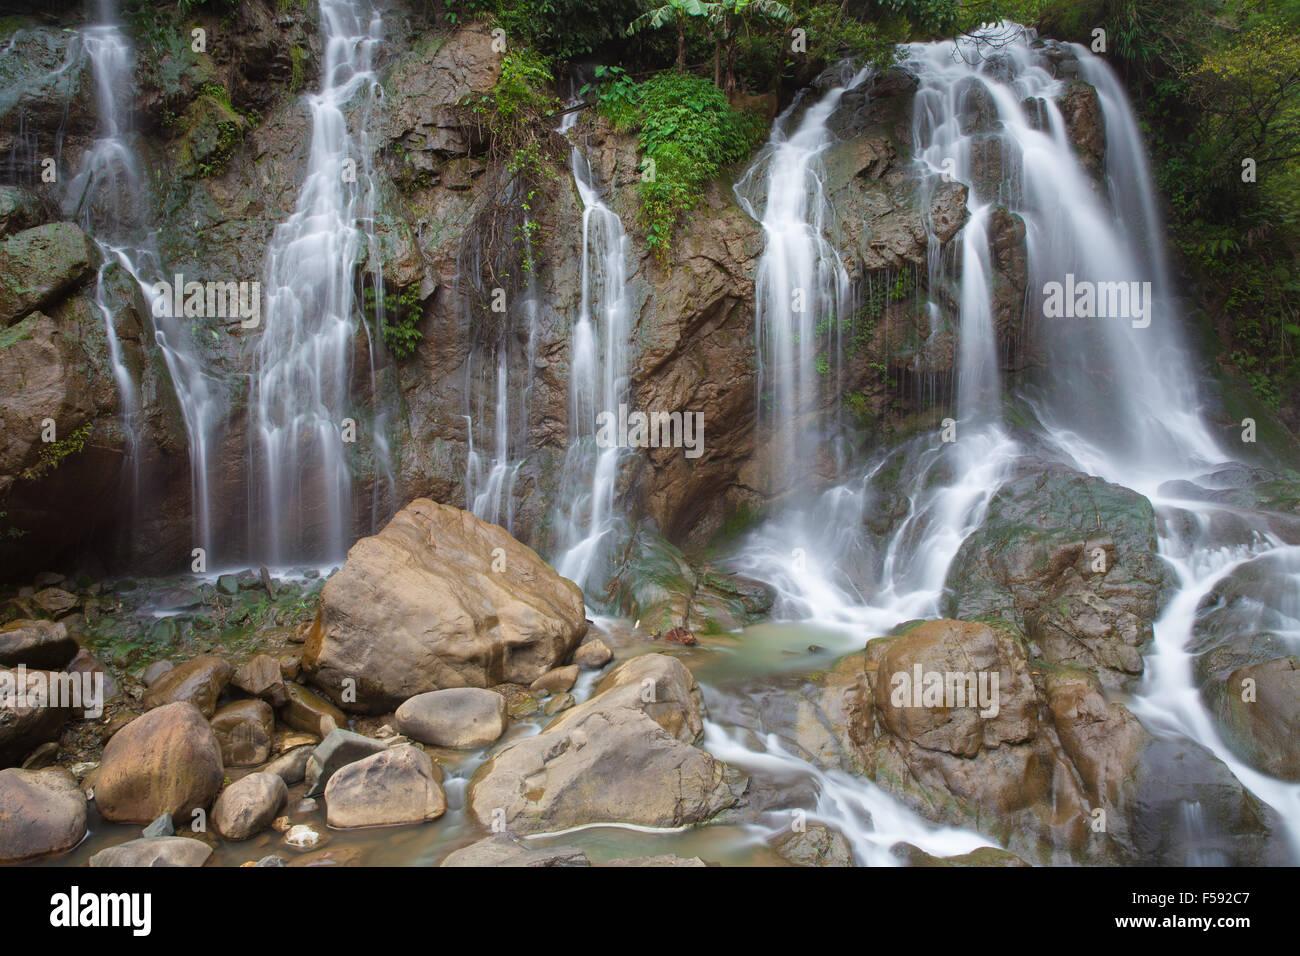 Tien Sa Waterfall, Sapa village, Lao Cai Province, Northwest Vietnam. - Stock Image